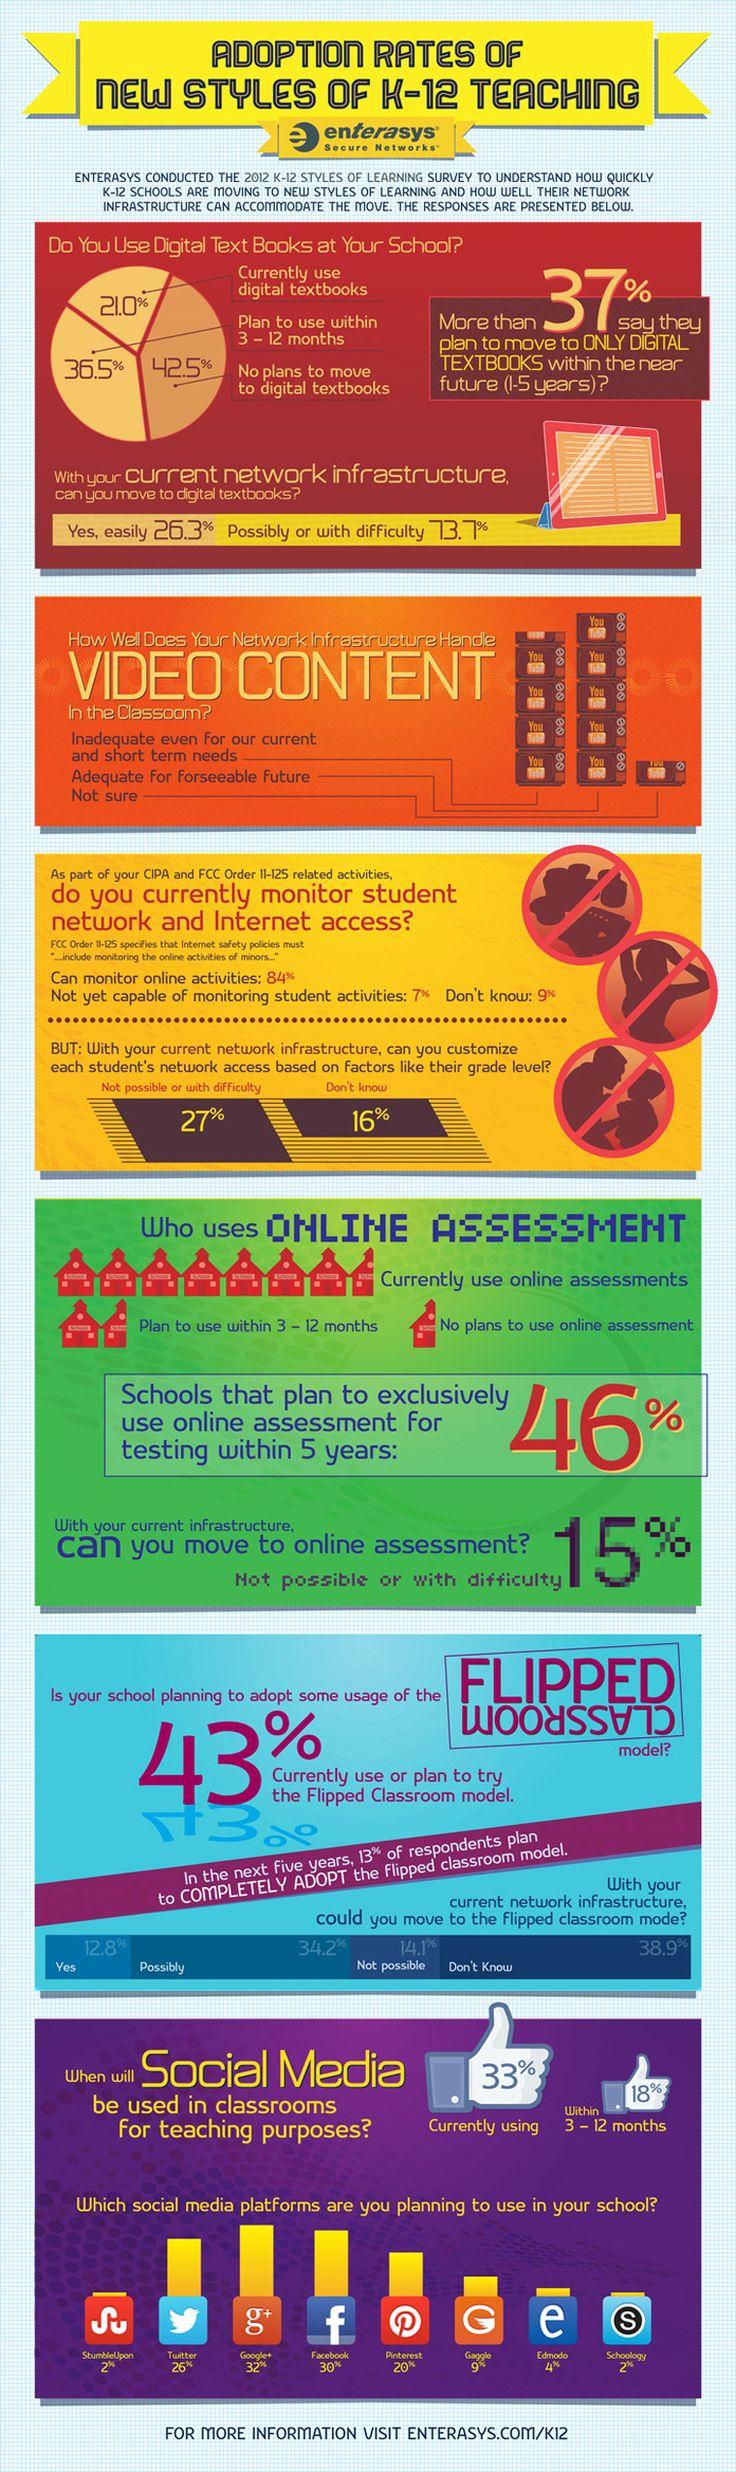 6 Hot Trends in Educational Te